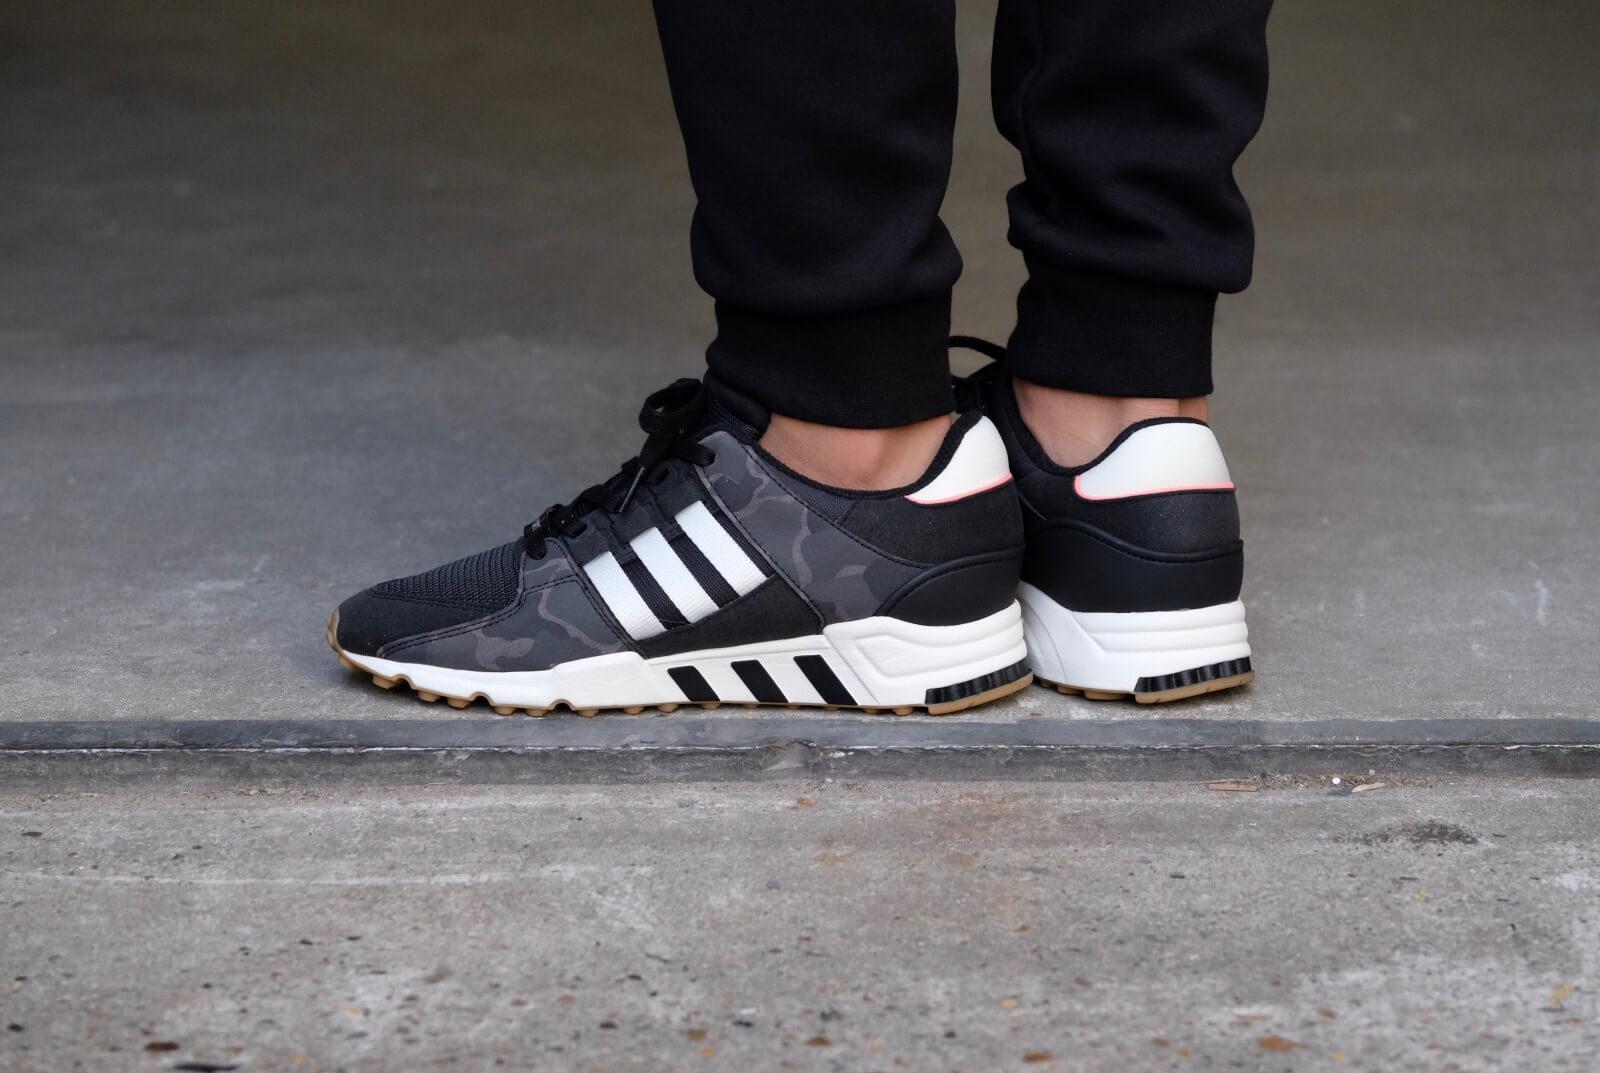 Adidas EQT Support RF Core Black/Off White